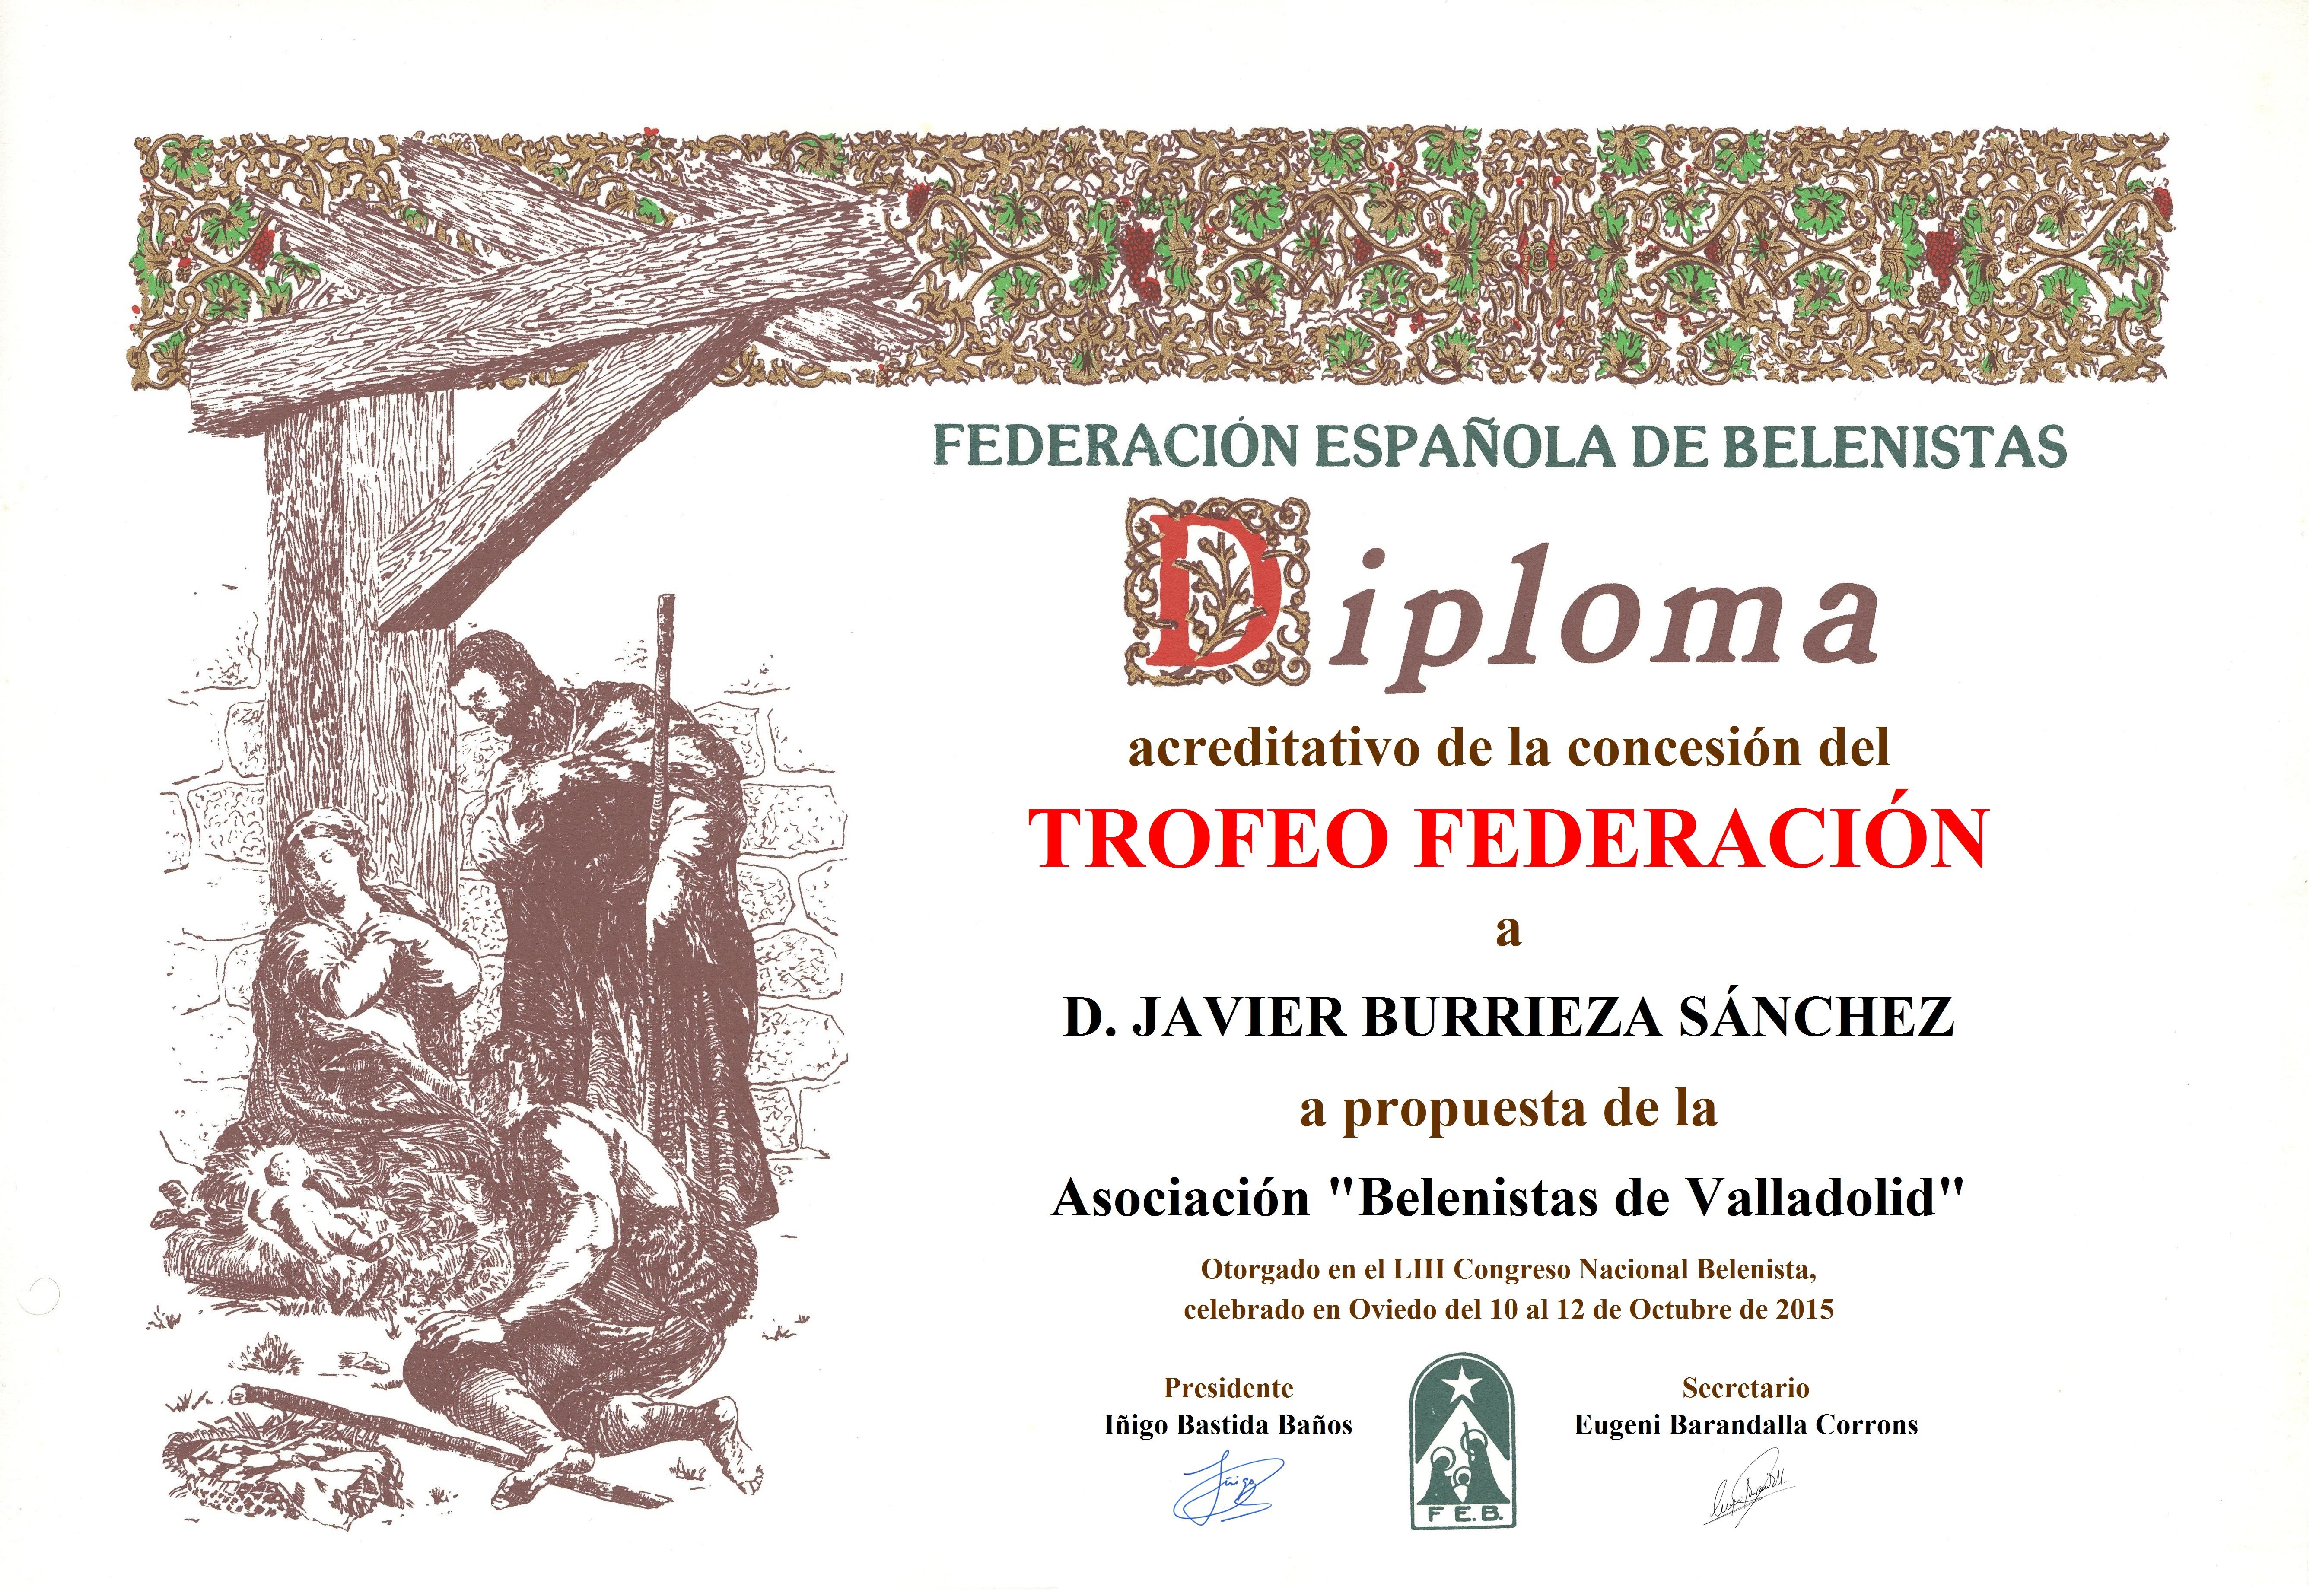 Diploma Trofeo FEB 2015 Javier Burrieza Sánchez